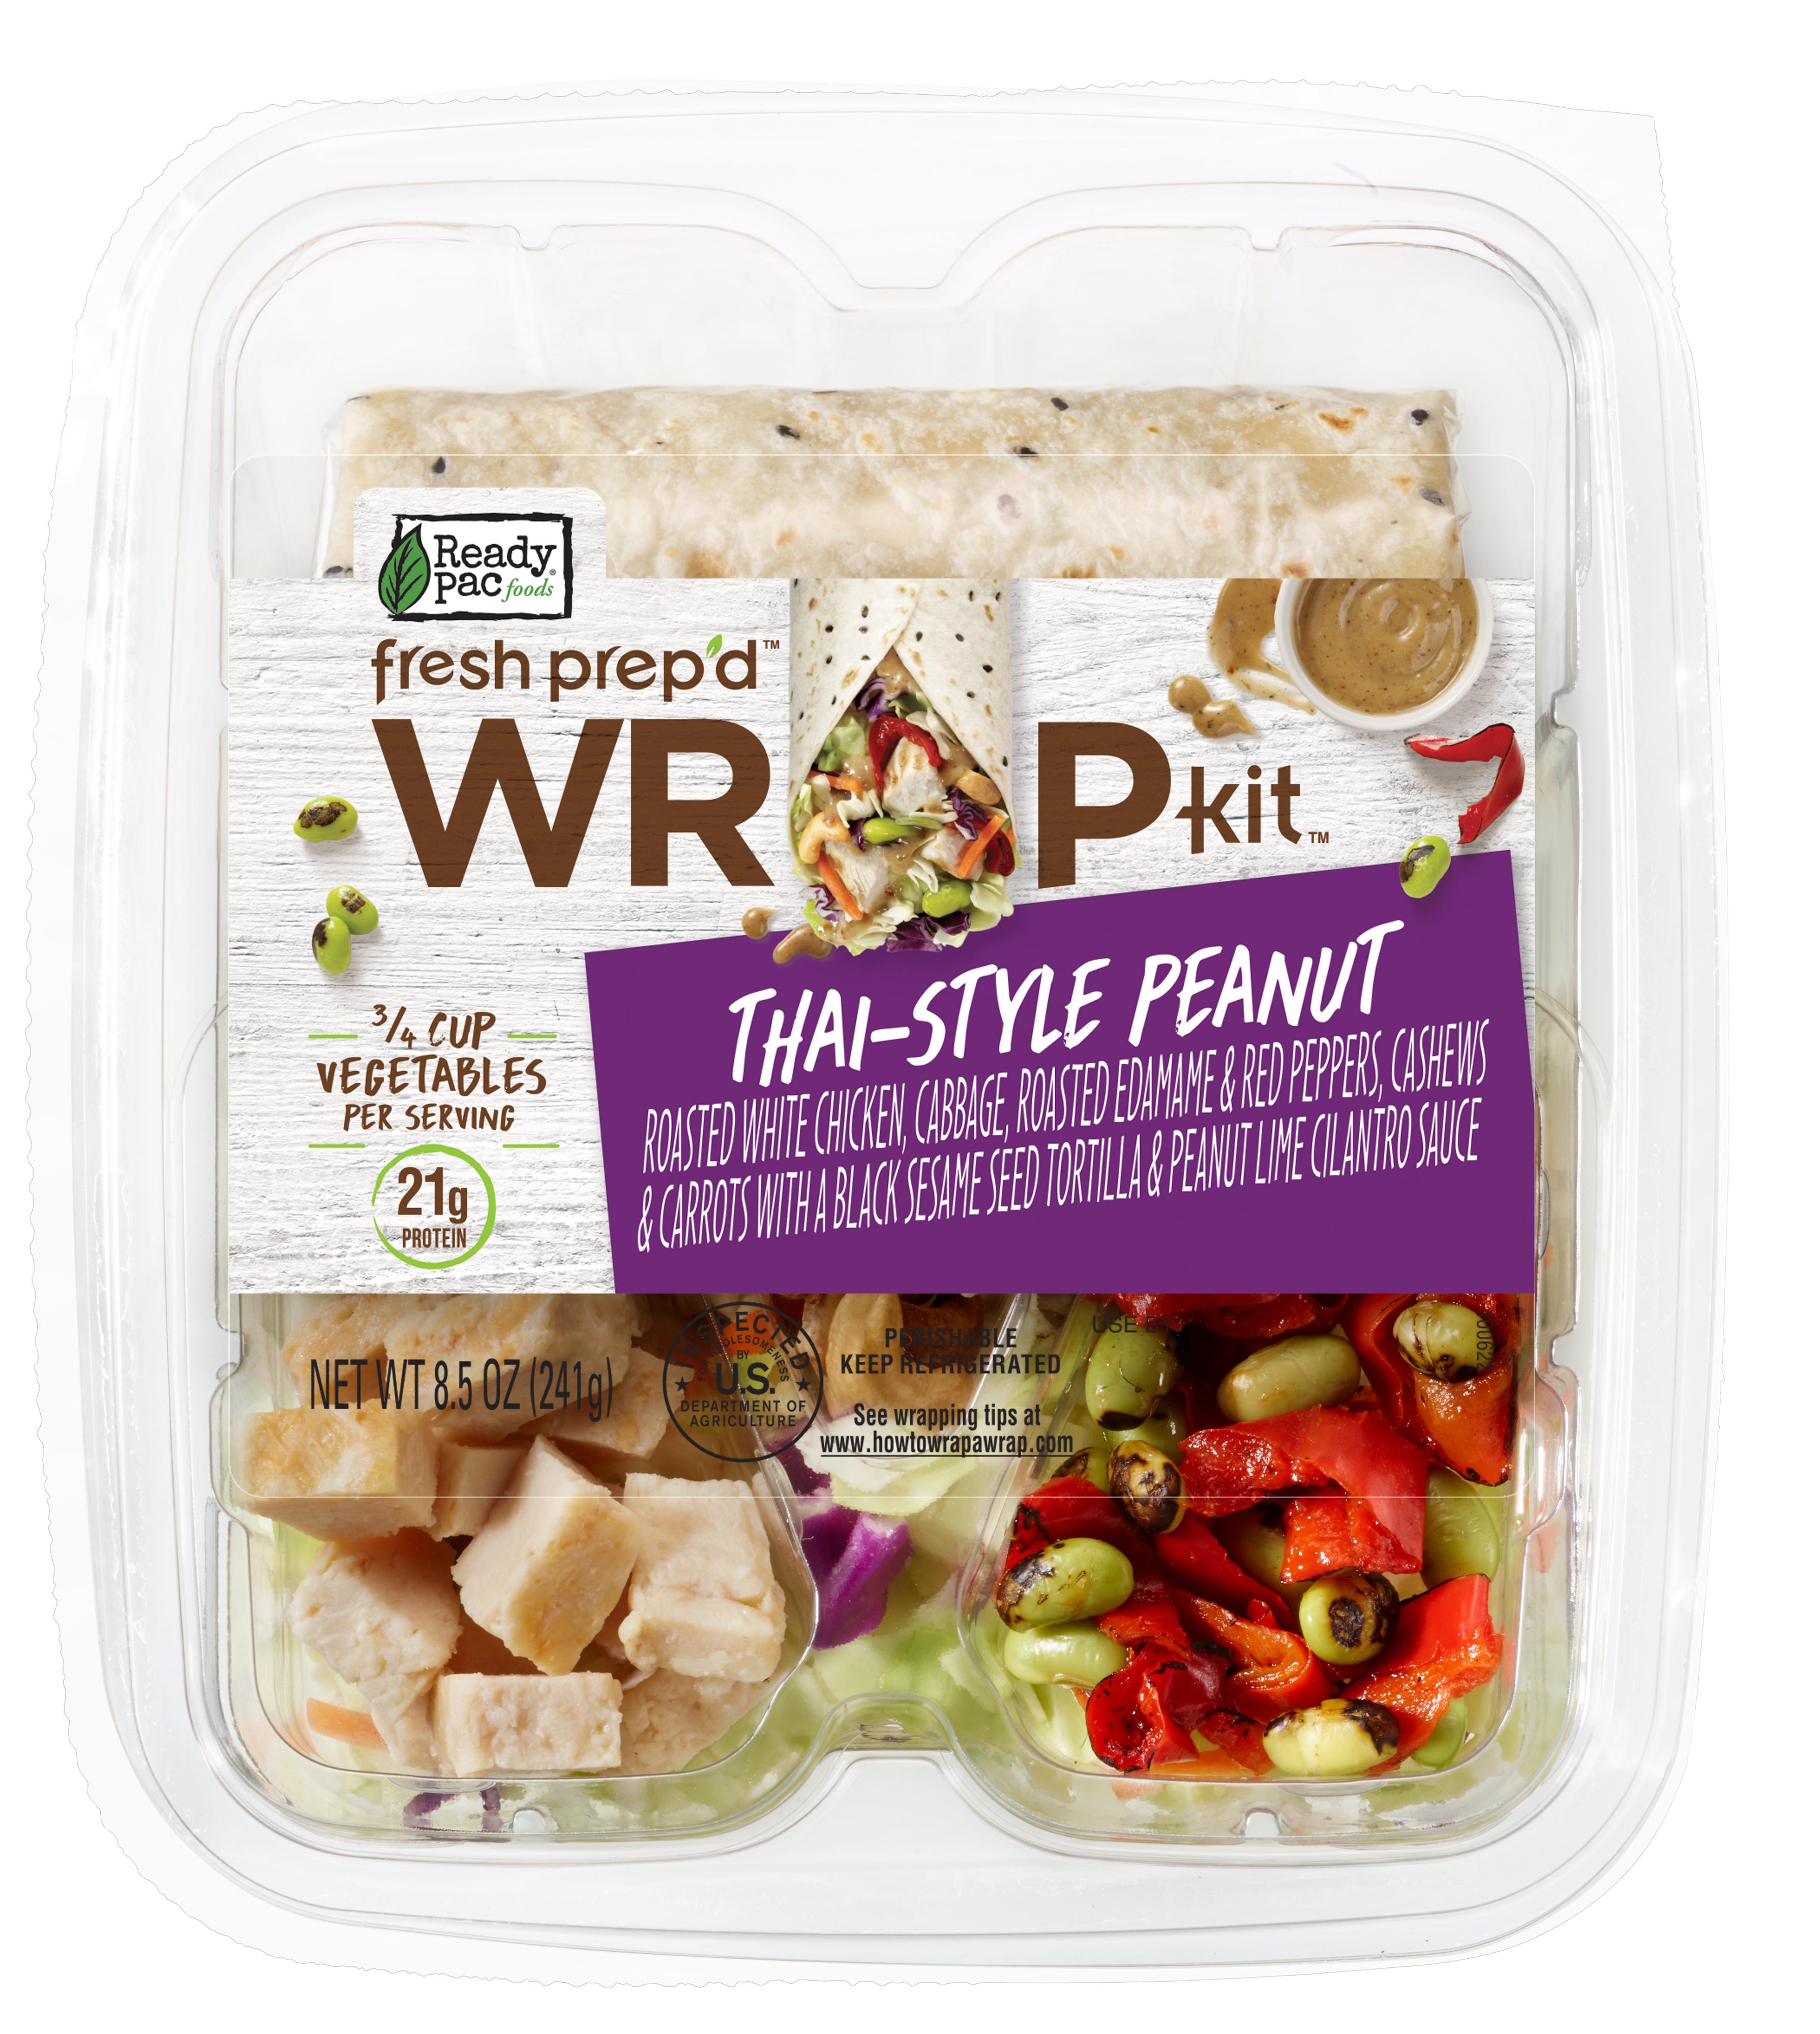 Ready Pac Foods Fresh Prep'd Wrap Kit Thai-Style Peanut